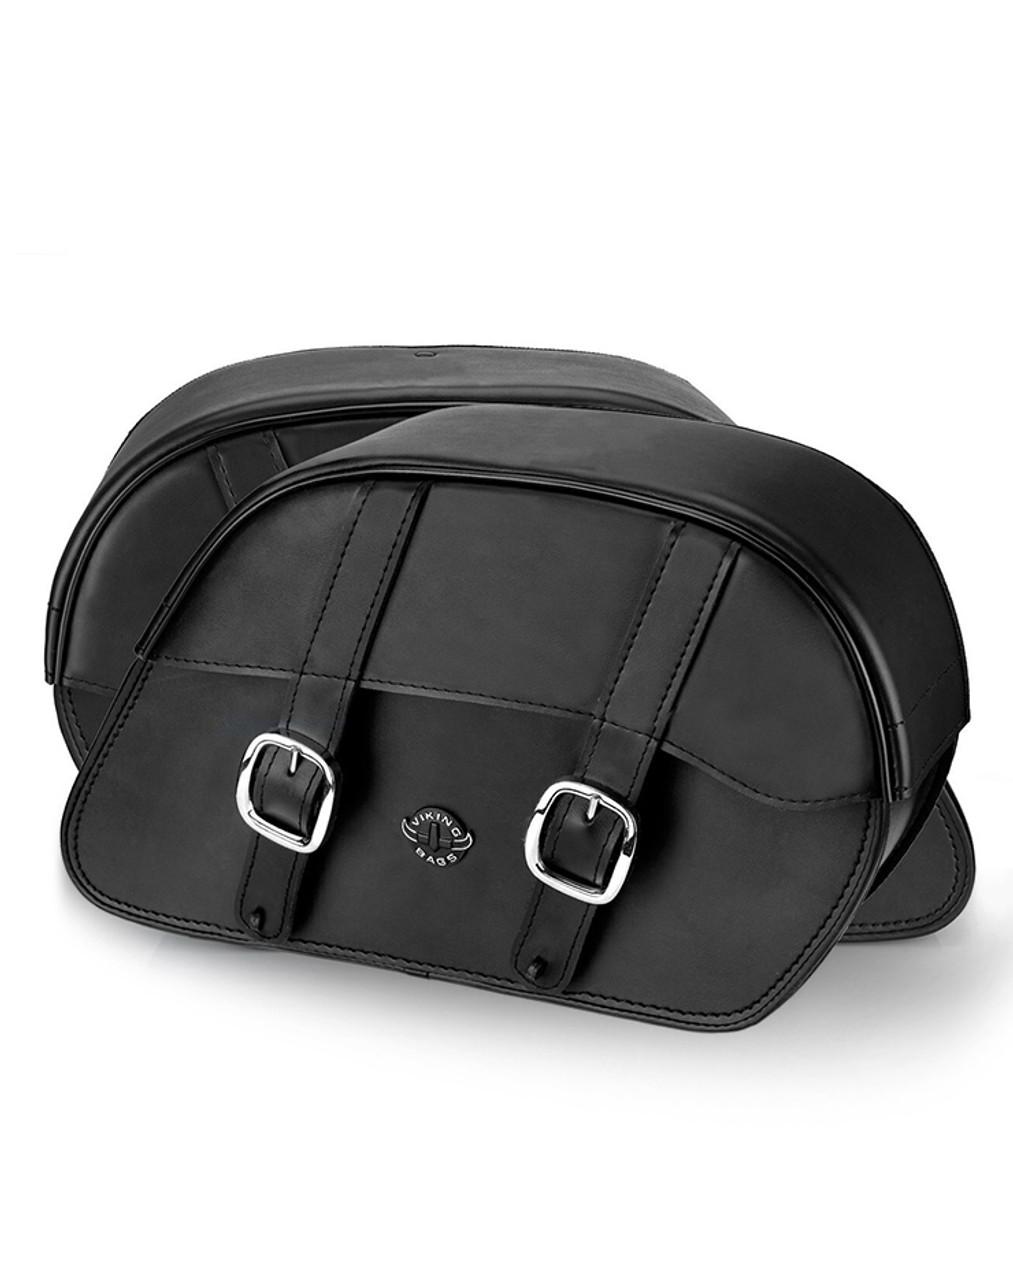 Honda 1500 Valkyrie Interstate Slanted Medium Motorcycle Saddlebags Both Bags View